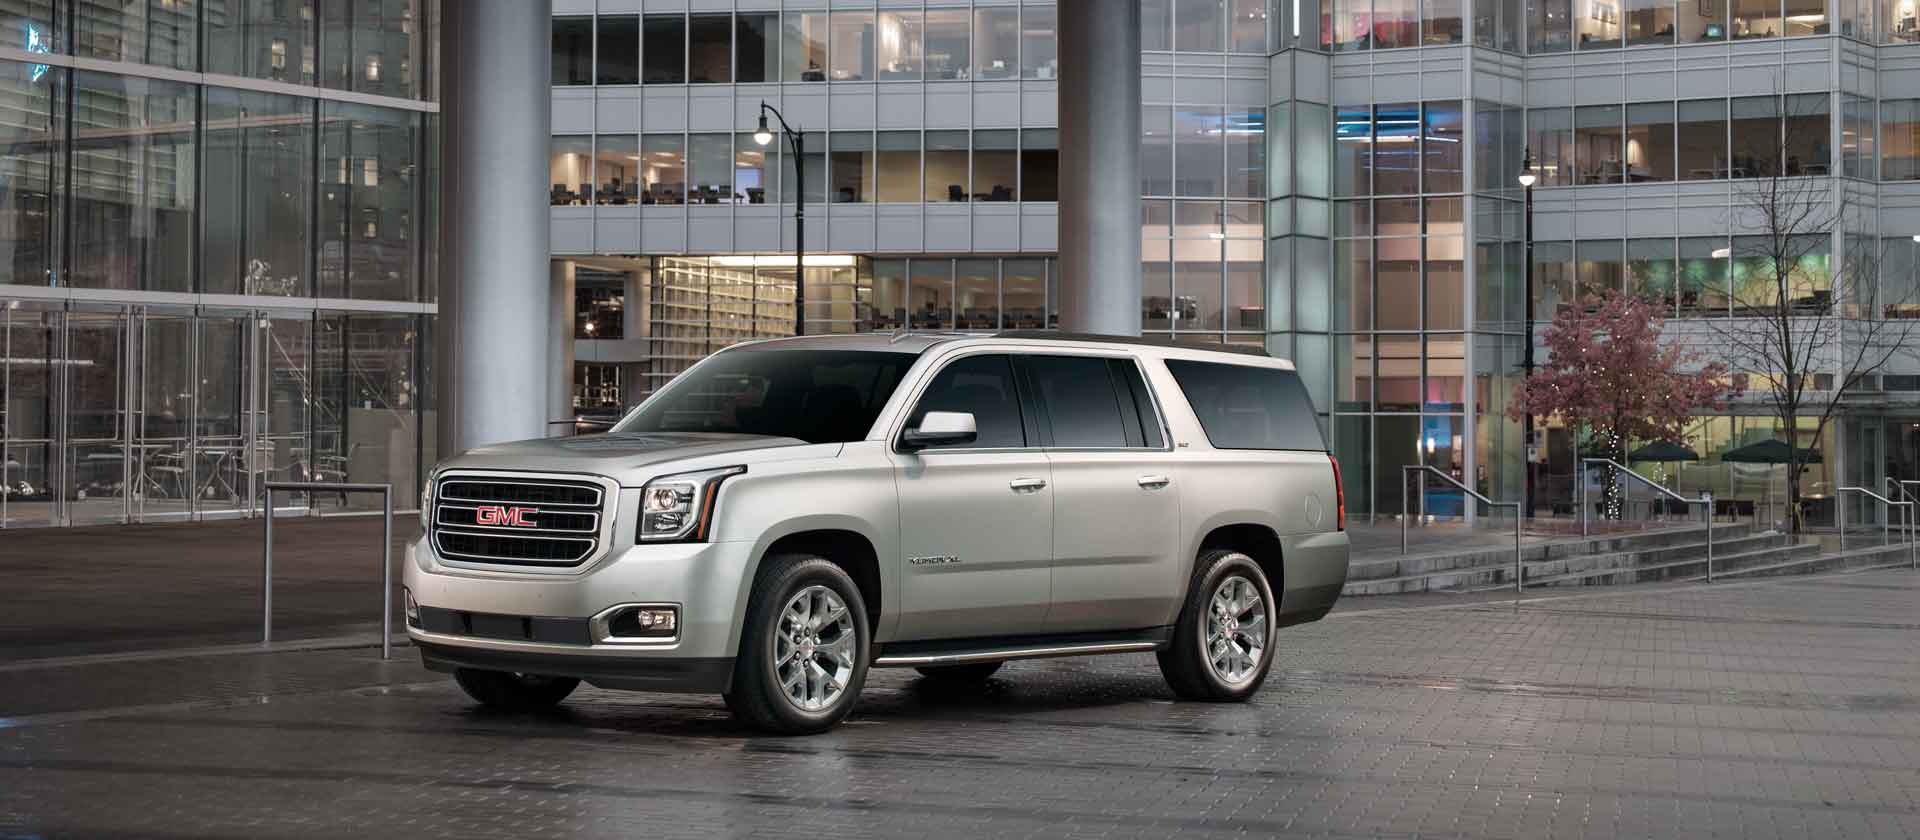 Longest Lasting SUV - Yukon XL